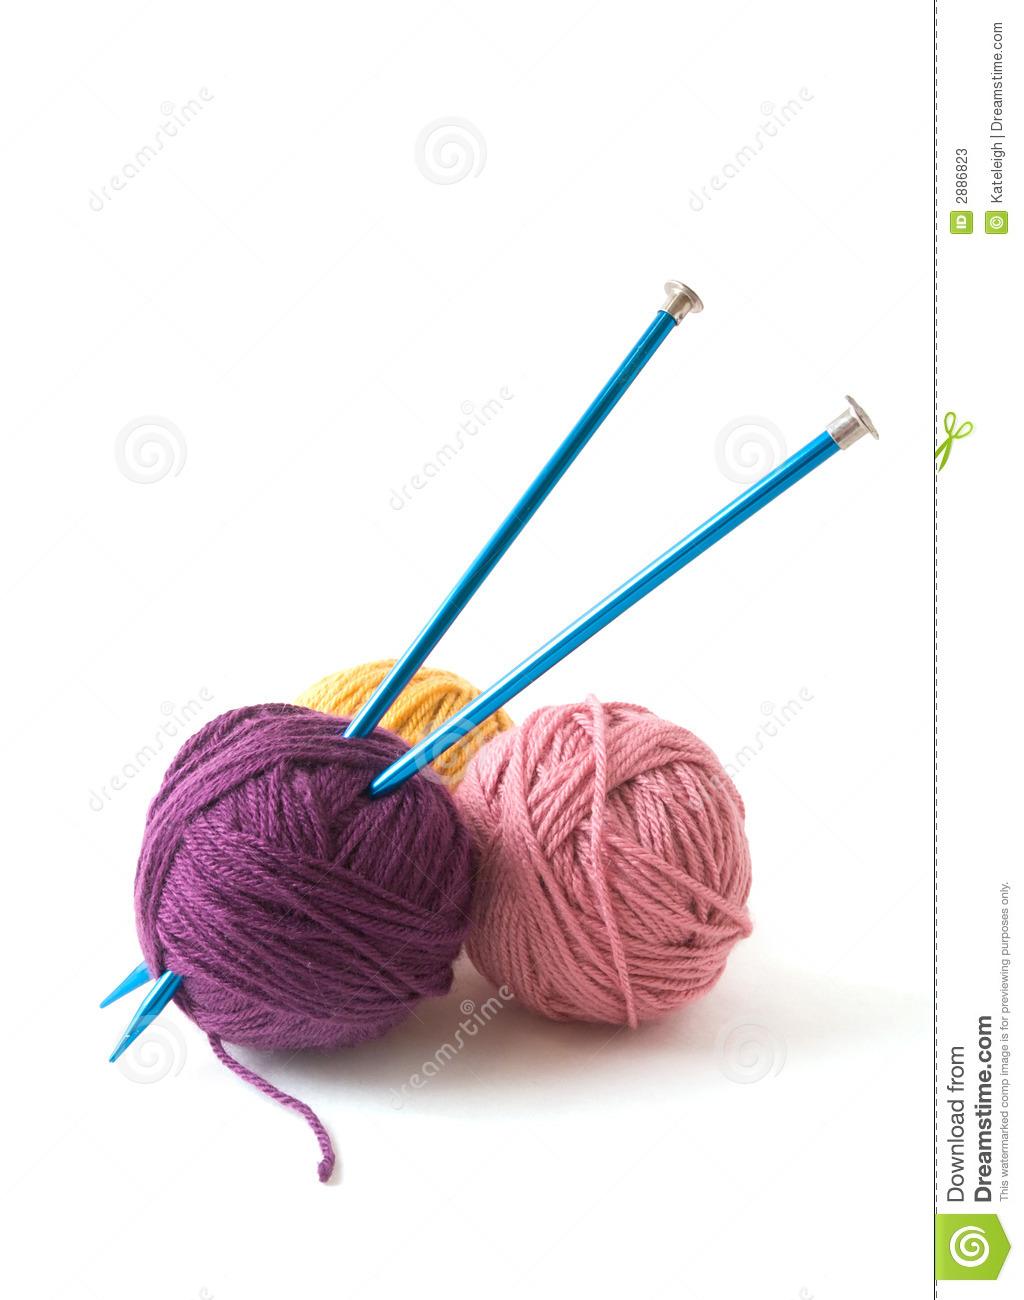 Вязание на спицах клубка нет 462